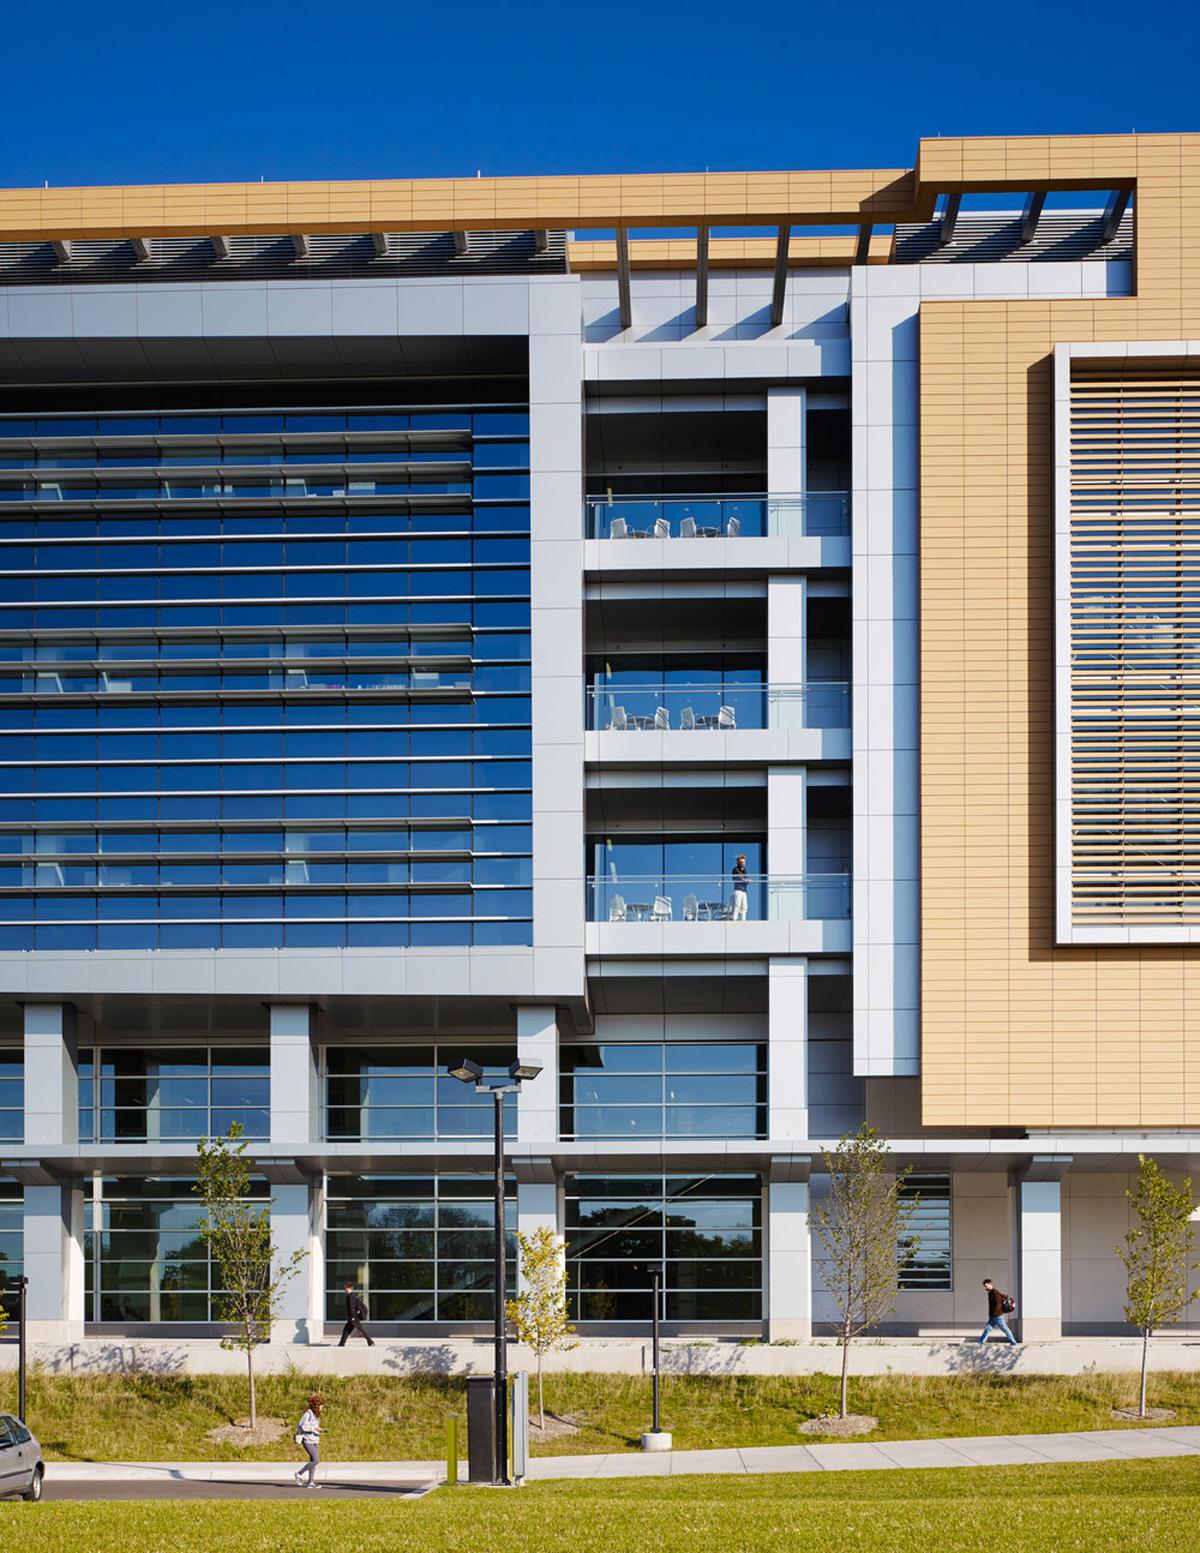 Kenwood Interdisciplinary Research Complex FLAD Architects John W McDougall Co Inc ALPOLIC ACM Valspar Valflon Lumiflon FEVE Resin